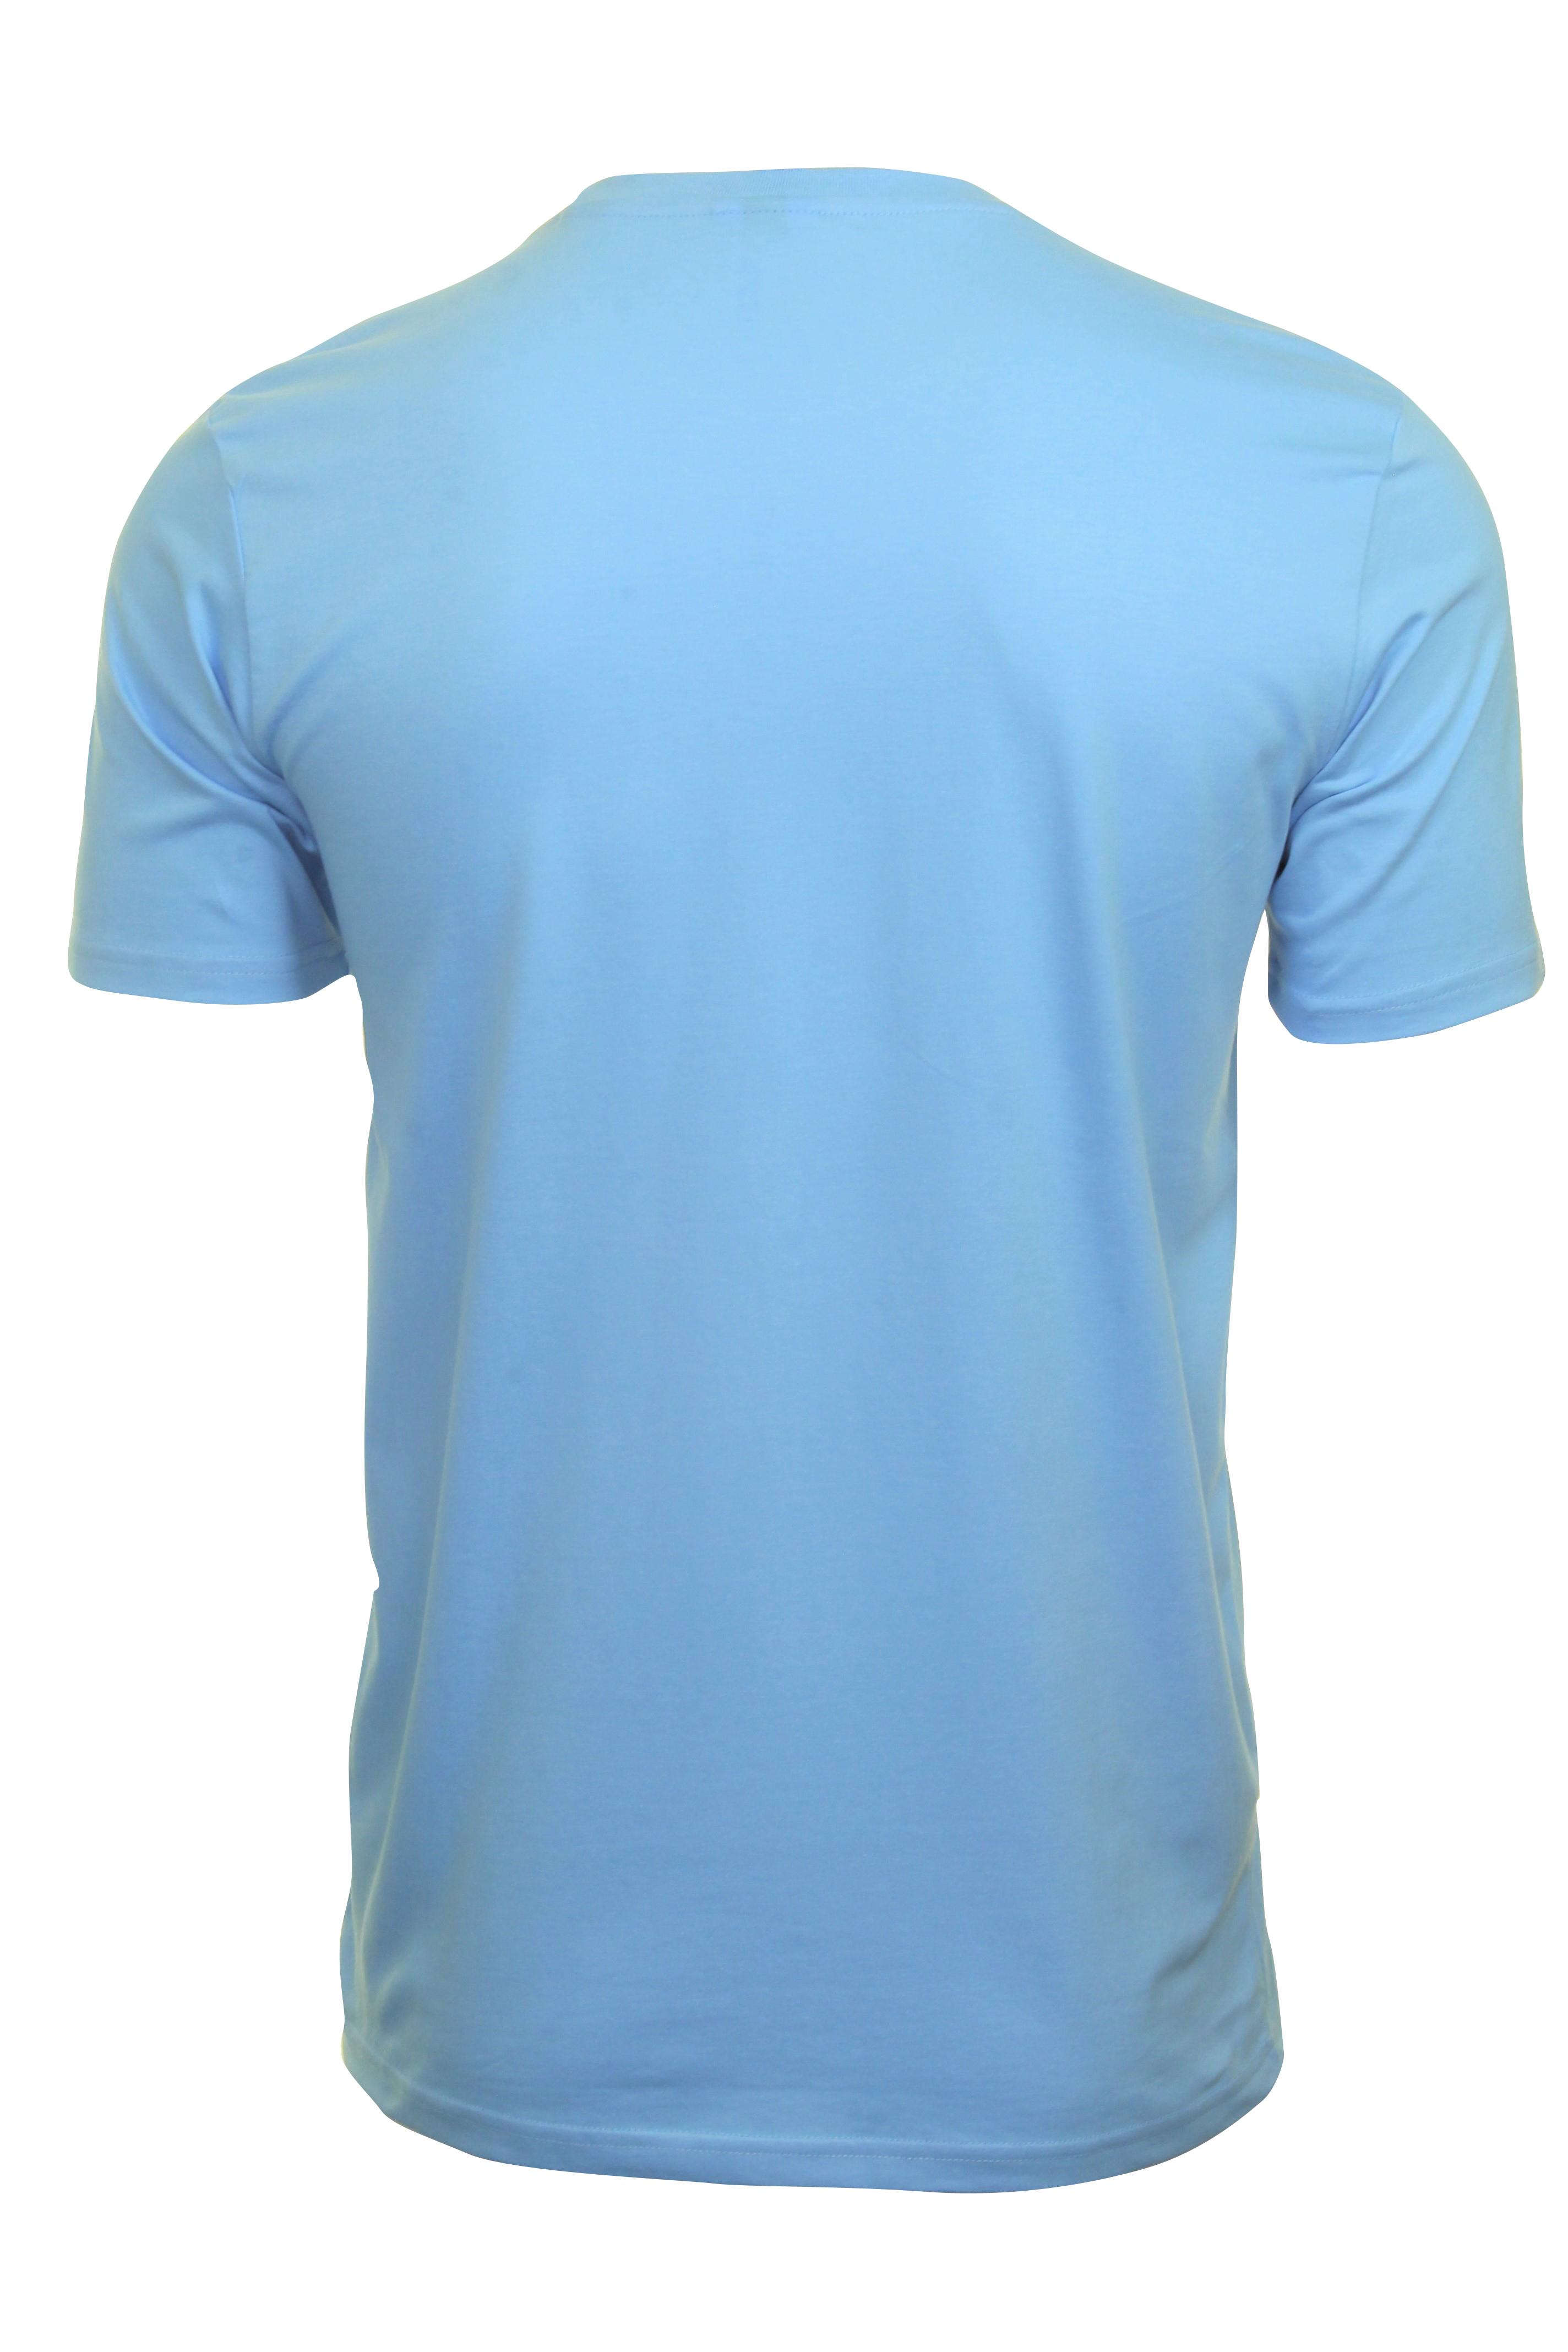 Mens-Ellesse-T-Shirt-039-Prado-039-Short-Sleeved thumbnail 12